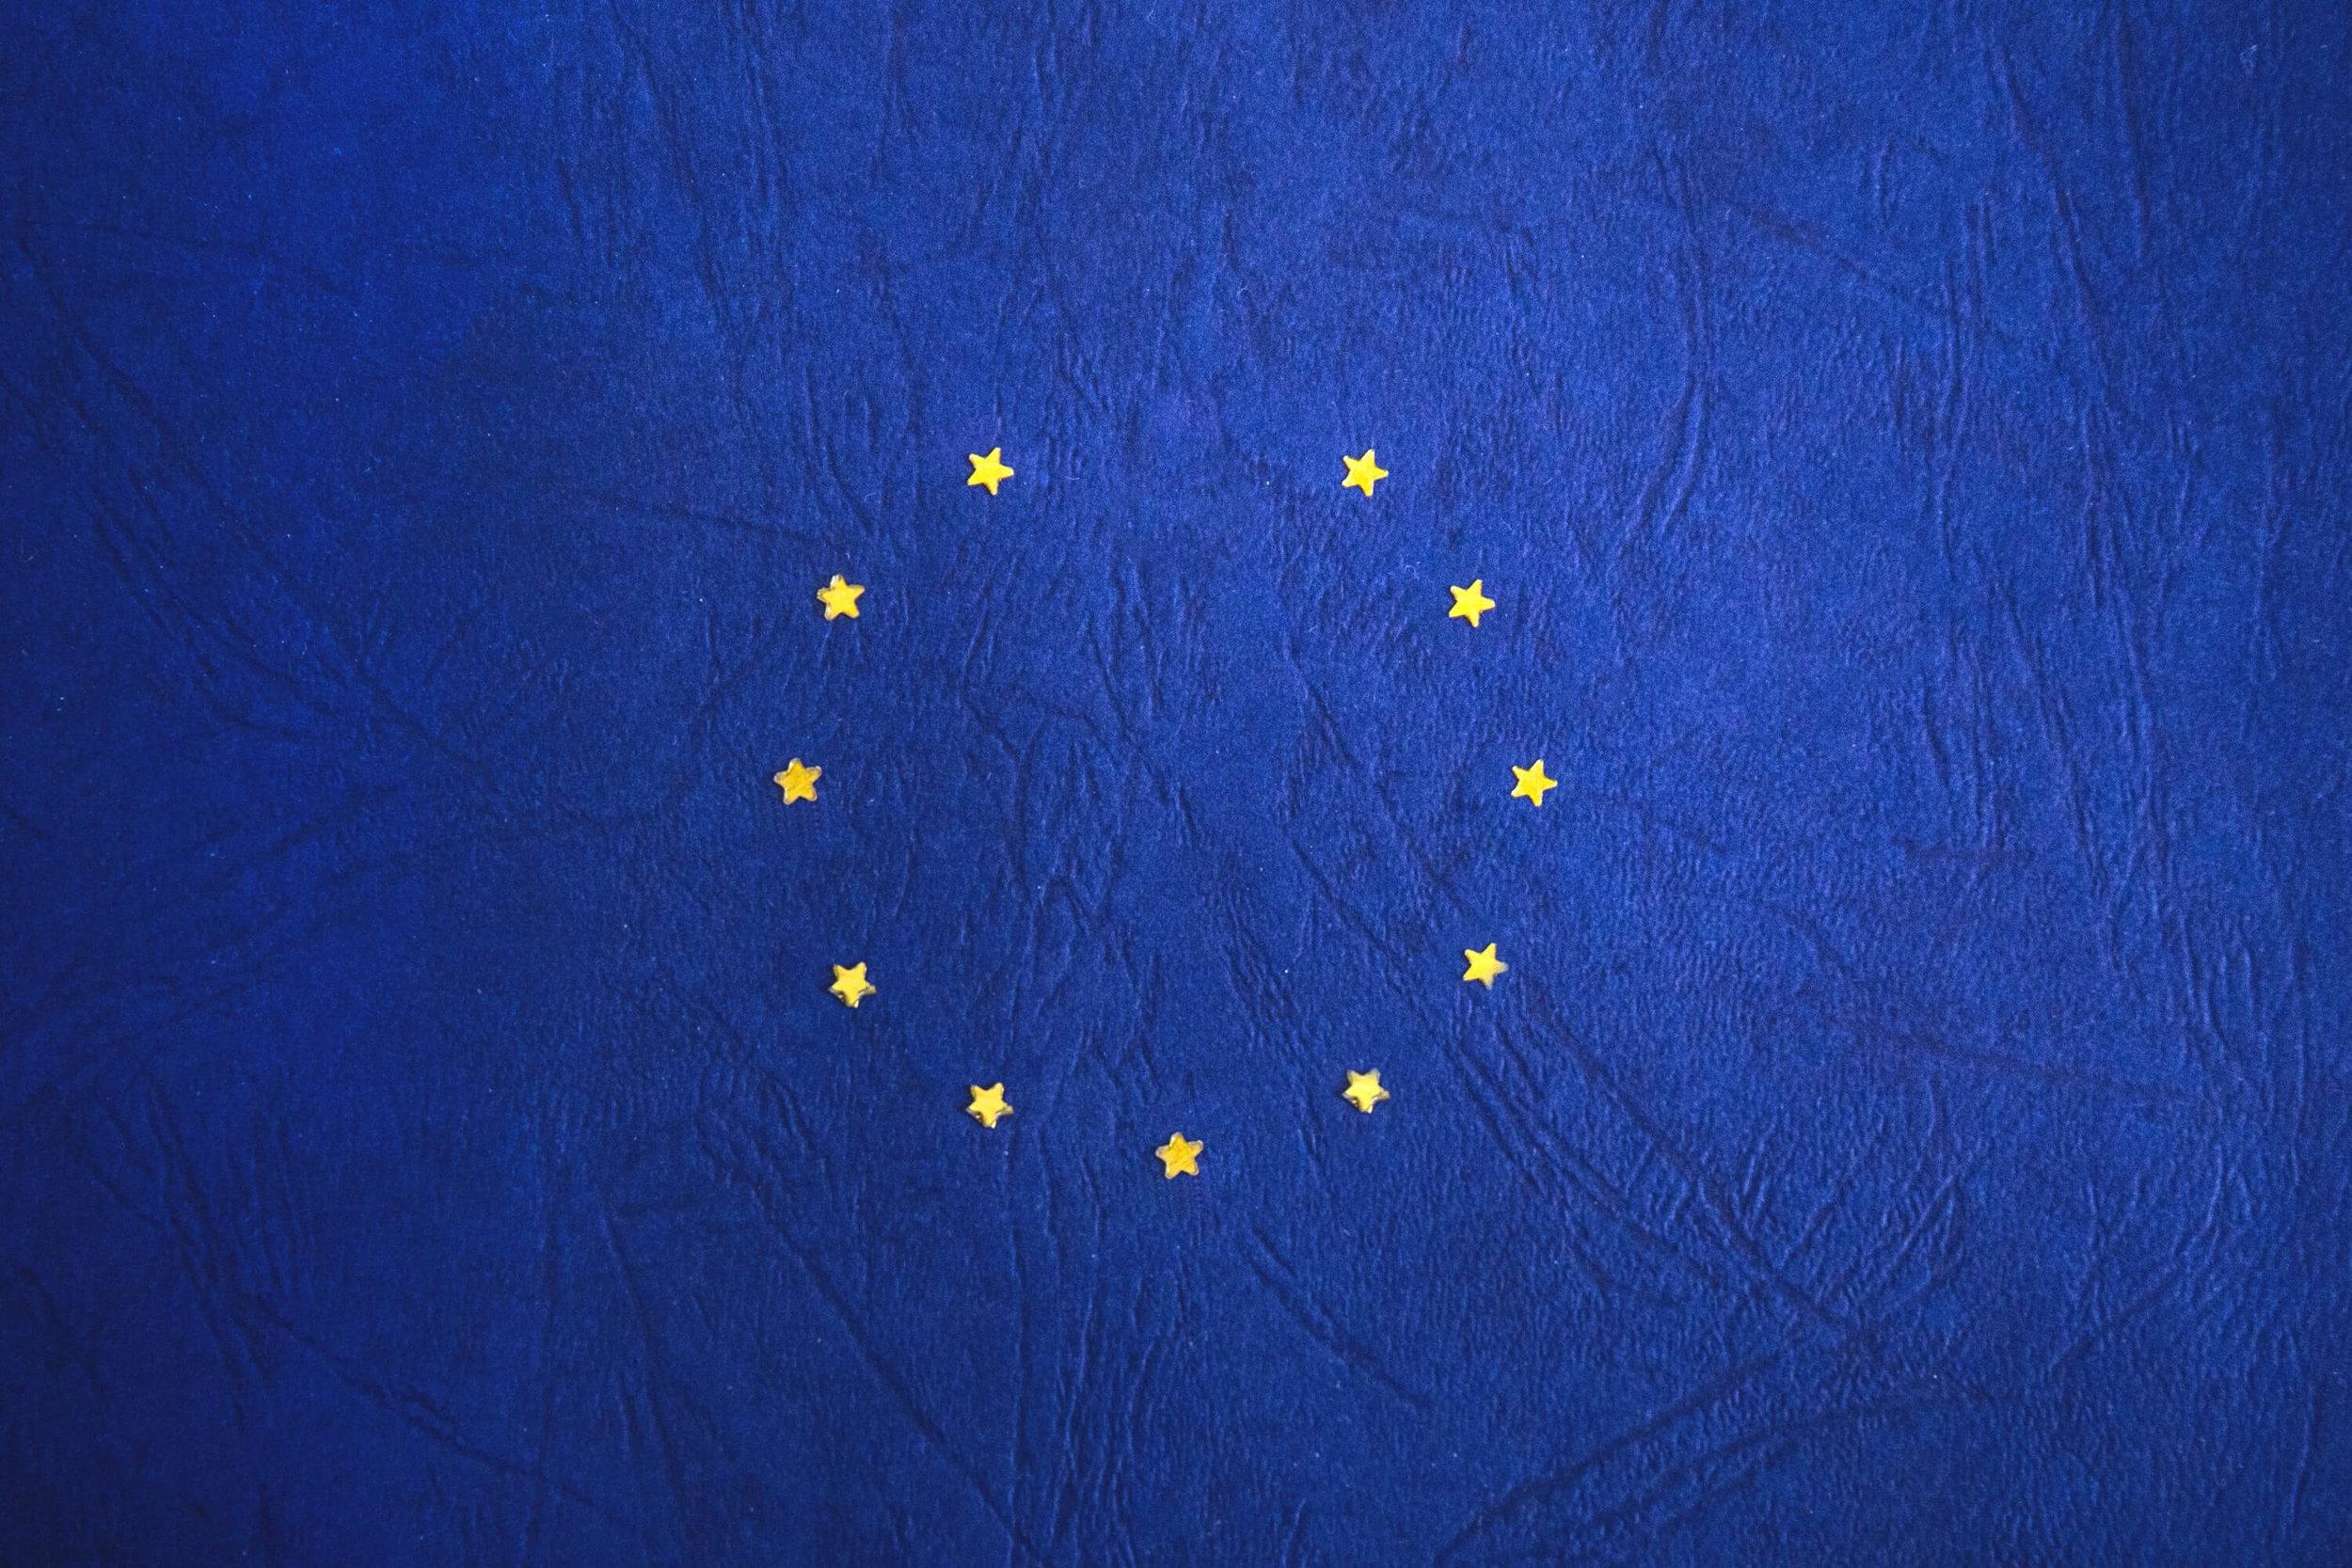 brexit-eu-europe-113885 (1).jpg